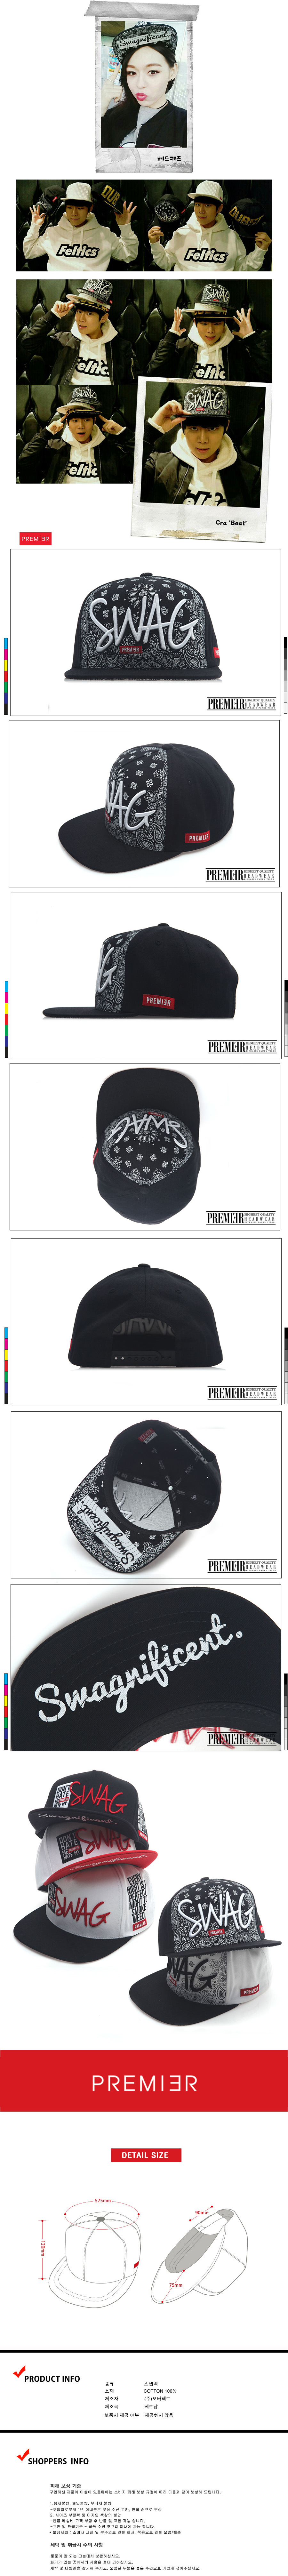 [ PREMIER ] [Premier] Snapback Paisley Swag Black/White